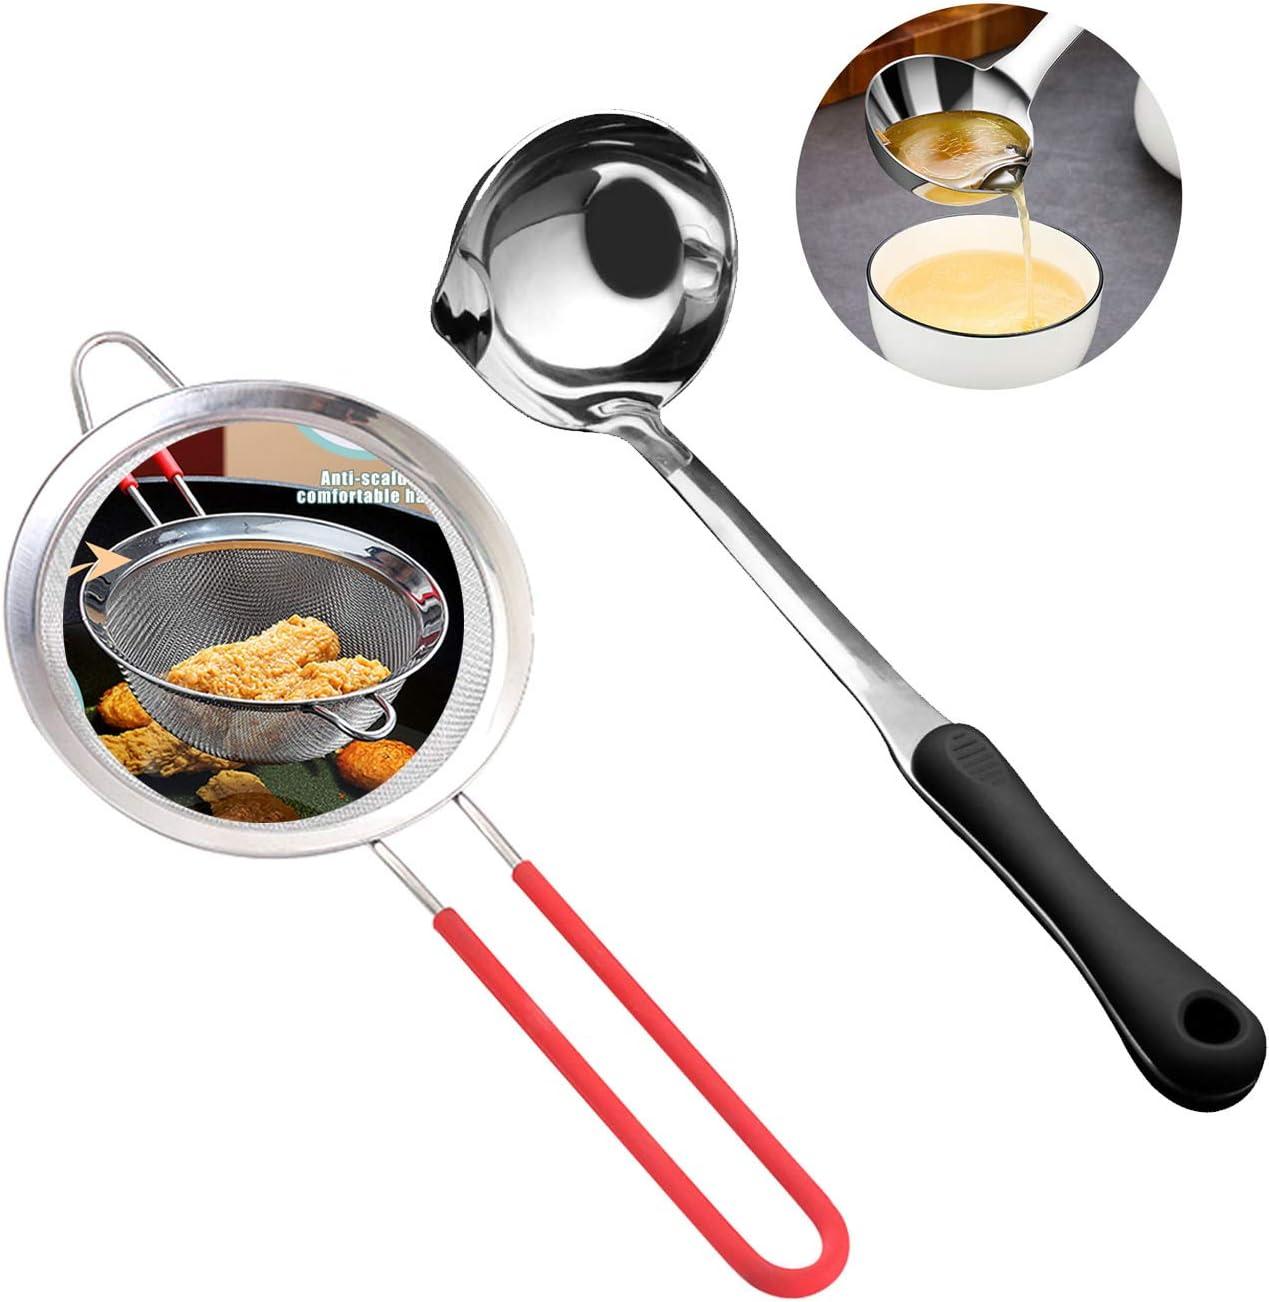 Fantakit 2 Set of Stainless Steel Mesh Food Juice Skimmer Strainer Ladle for Home Kitchen Soup Oil Separation Skimmer Slotted Spoon